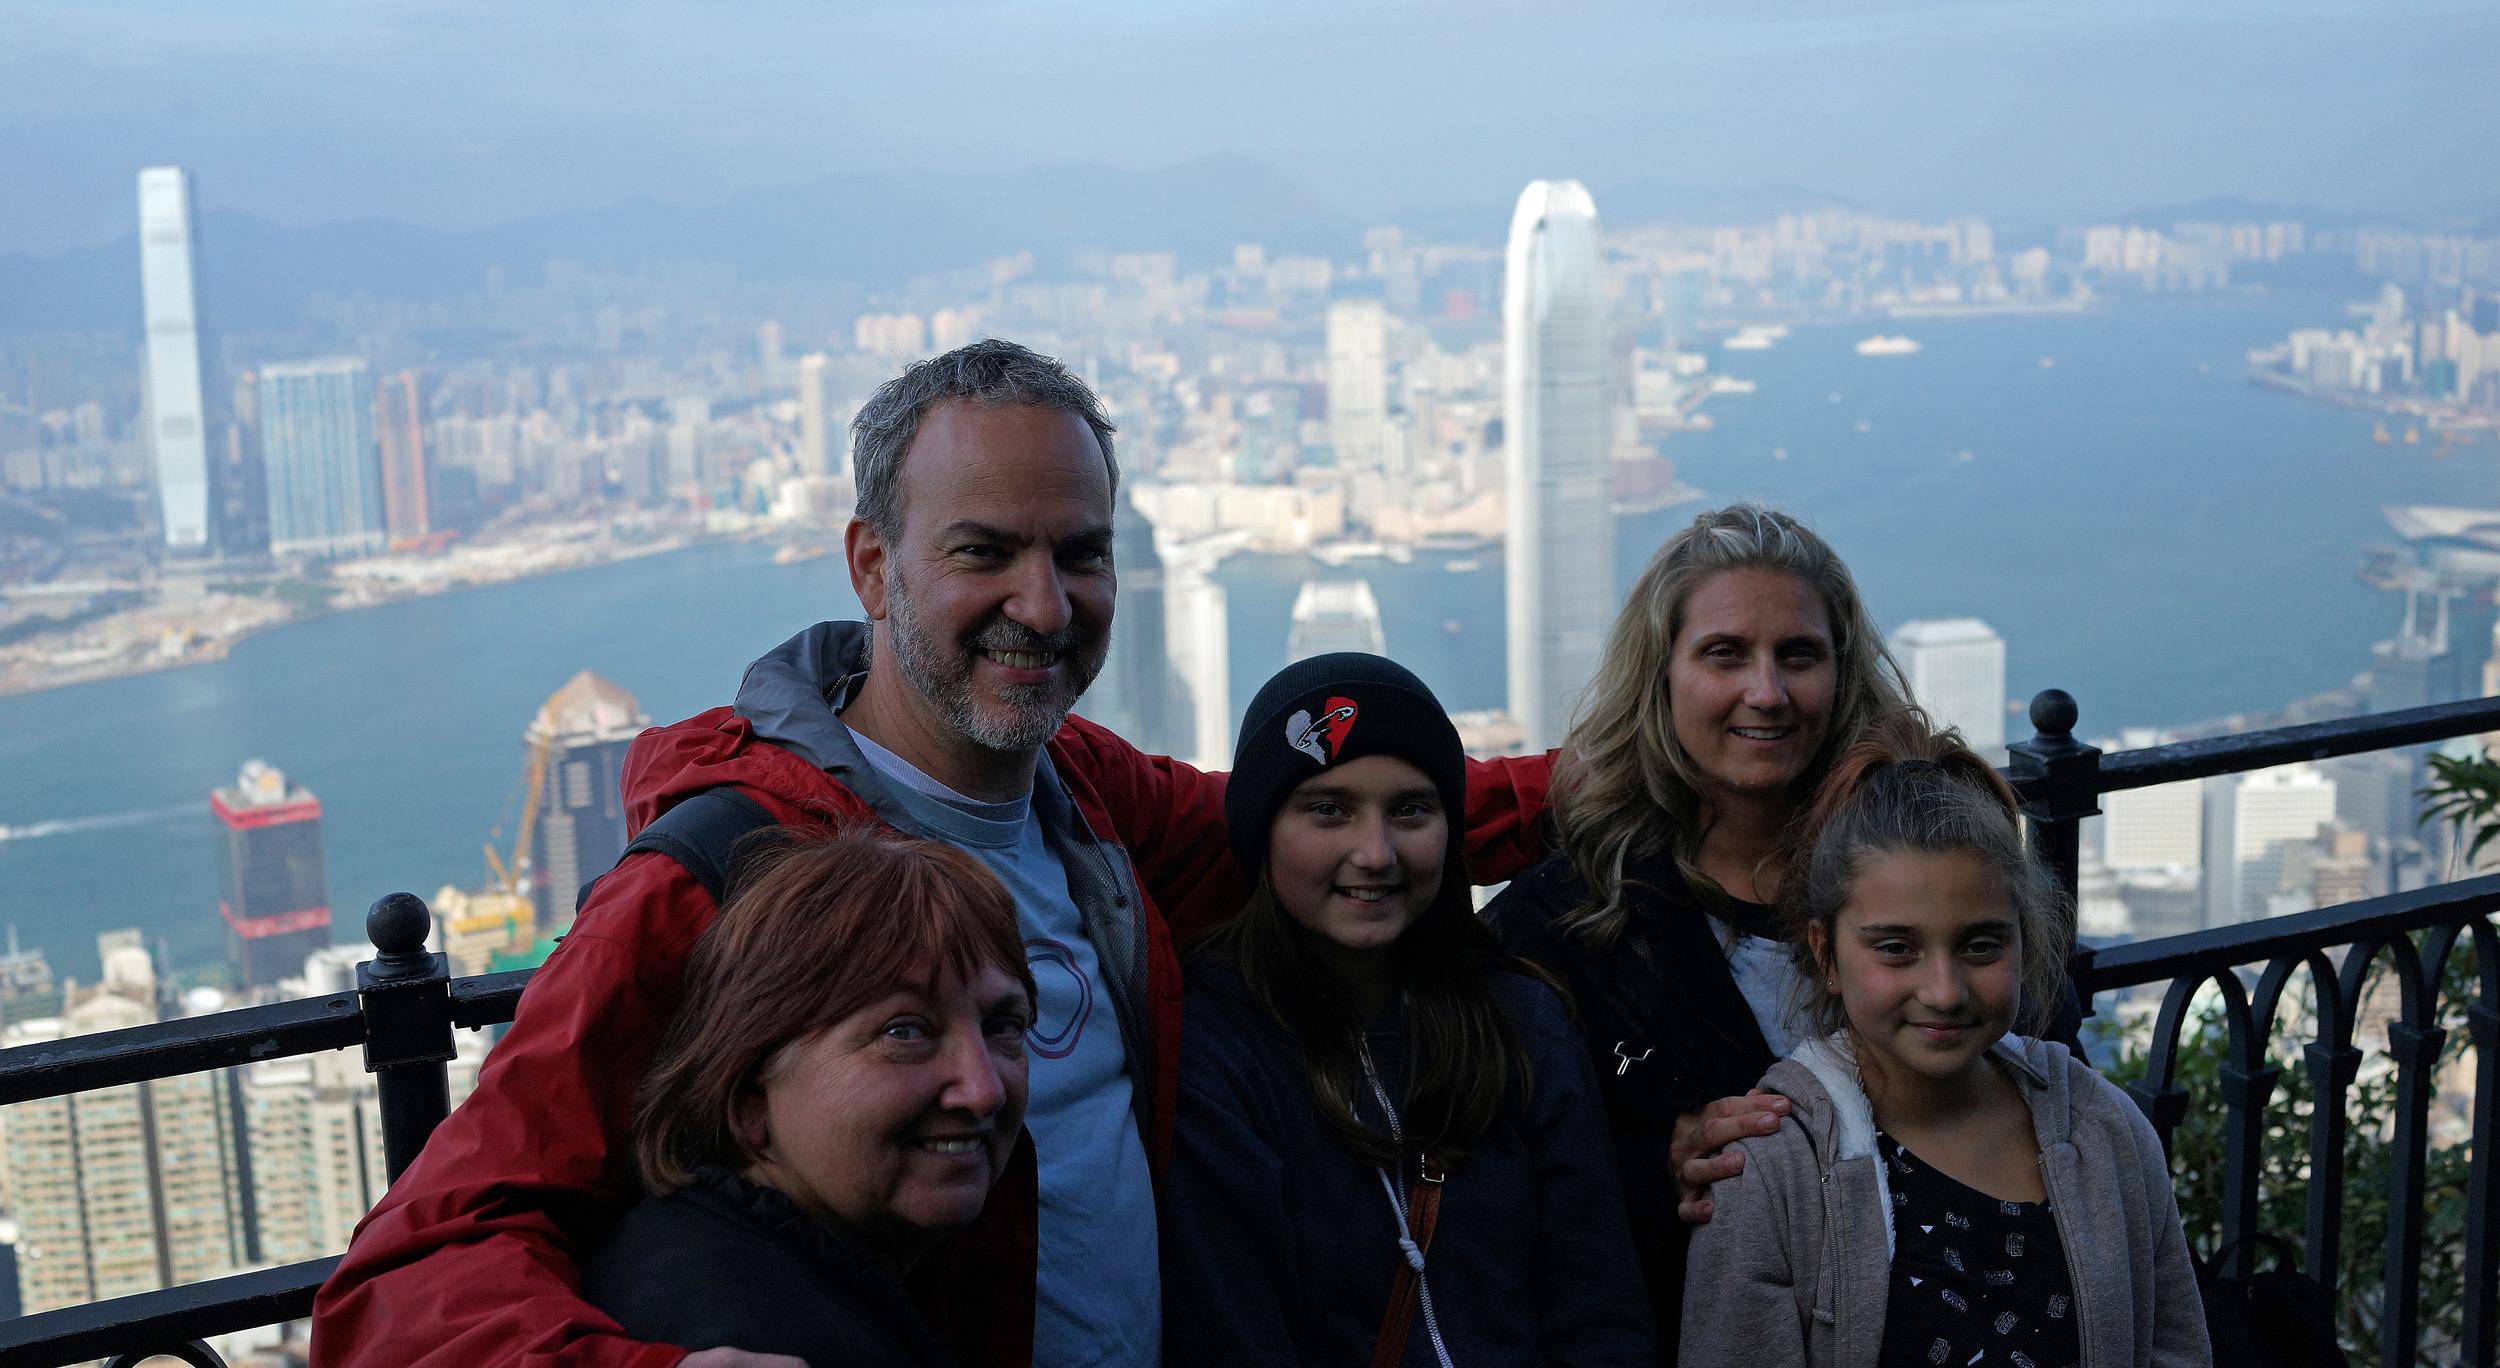 Dana, David, Mum and the girls enjoying the staggering views from my spot at the Peak